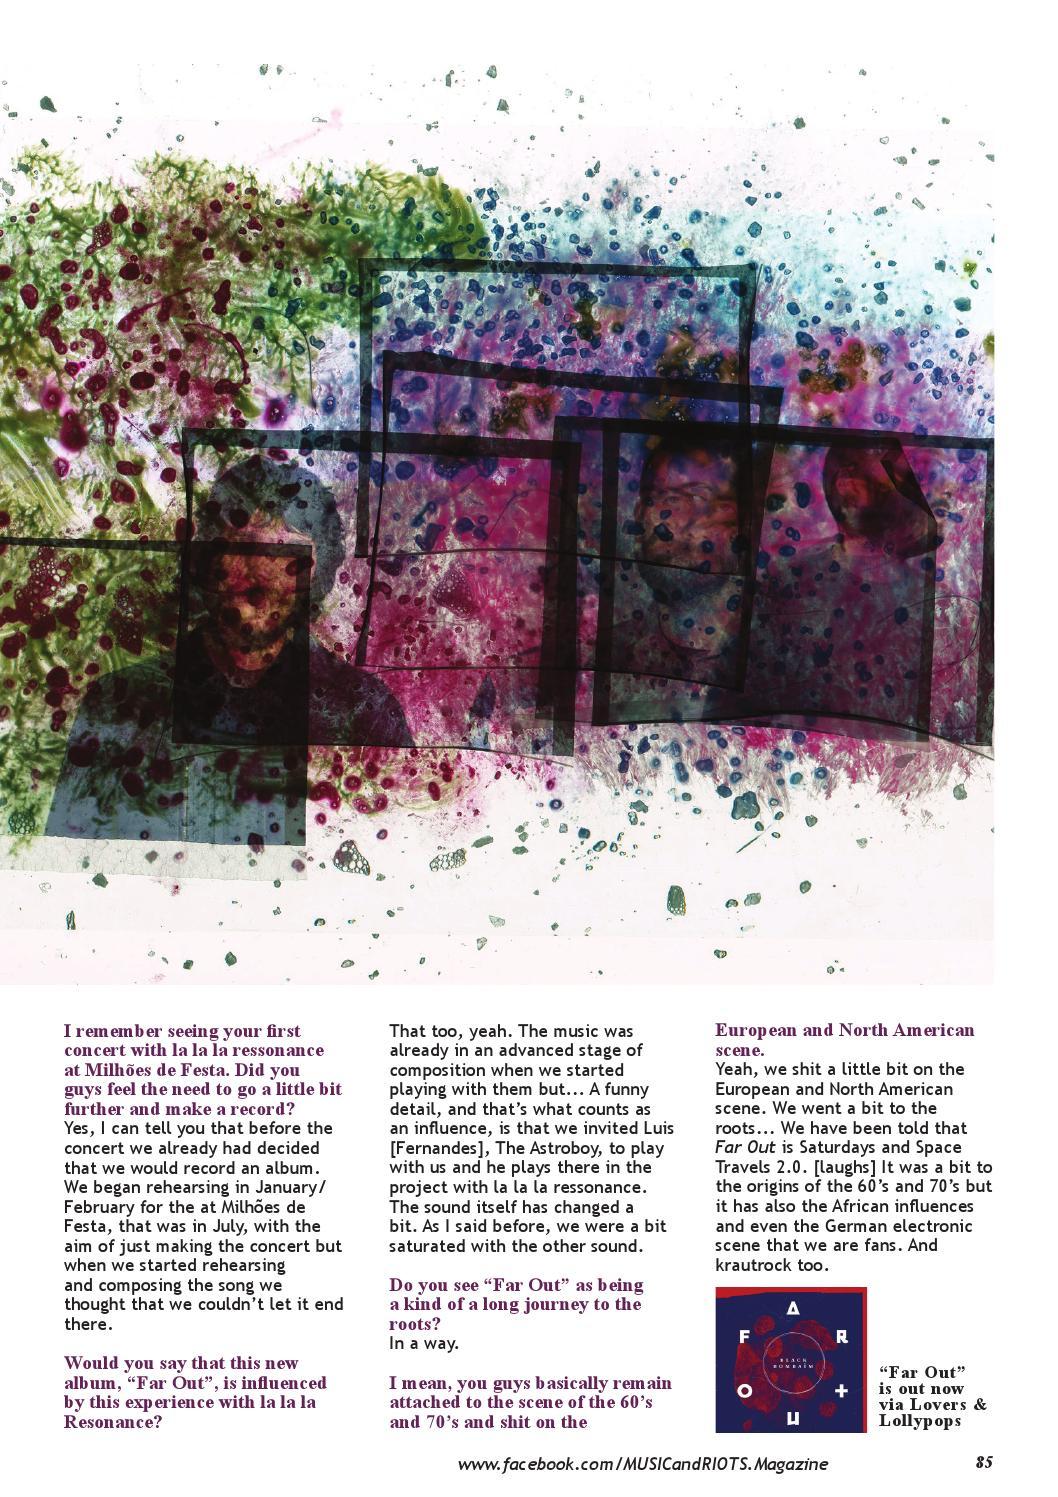 MUSIC&RIOTS Magazine 03 by MUSIC&RIOTS Magazine - issuu